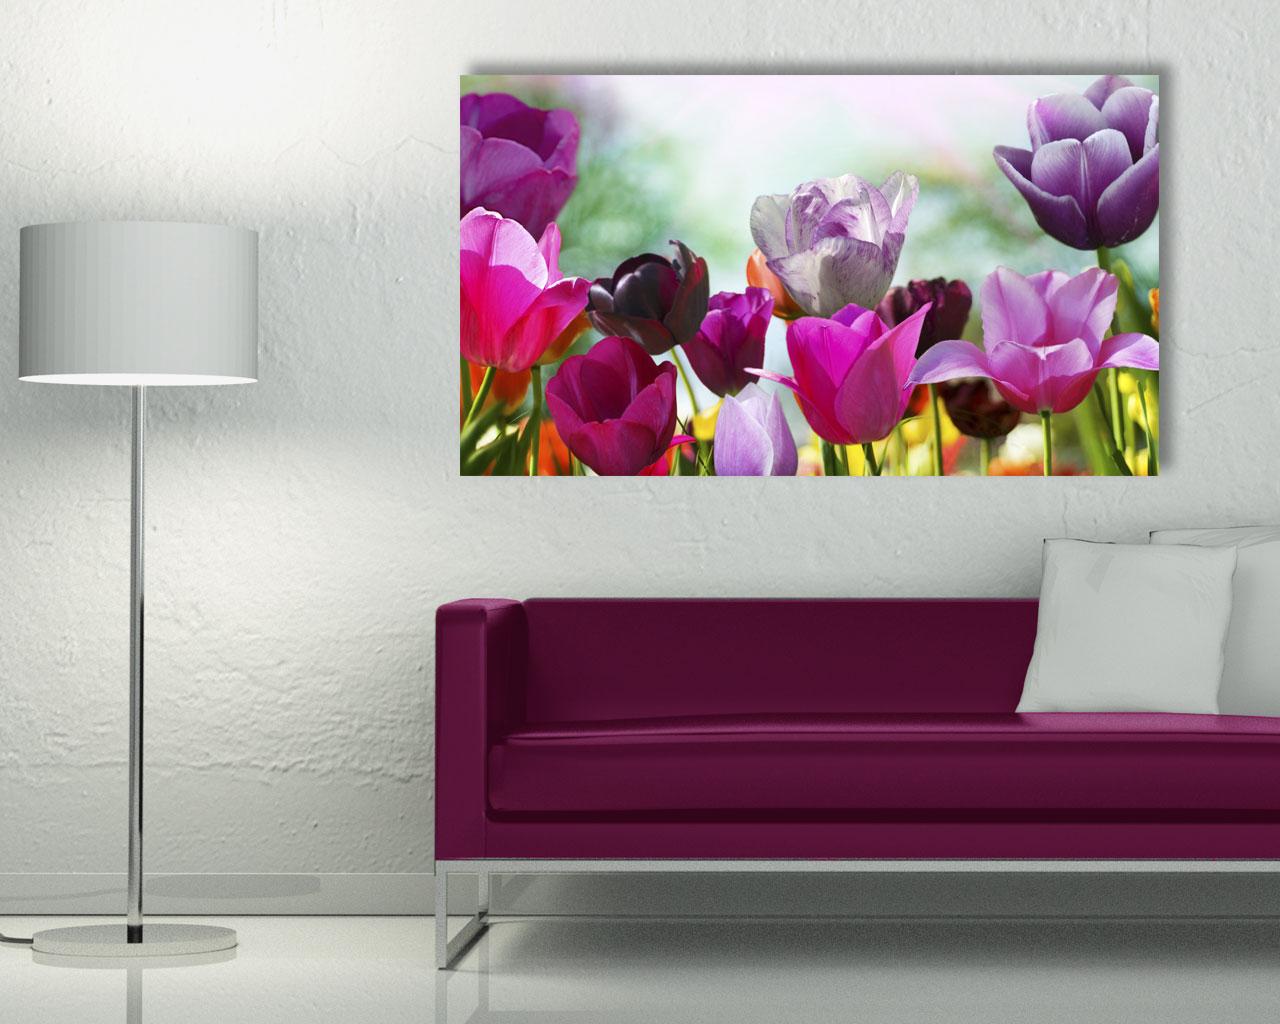 Variopinti tulipani fiori stampa su tela interni - Ikea stampe e quadri ...